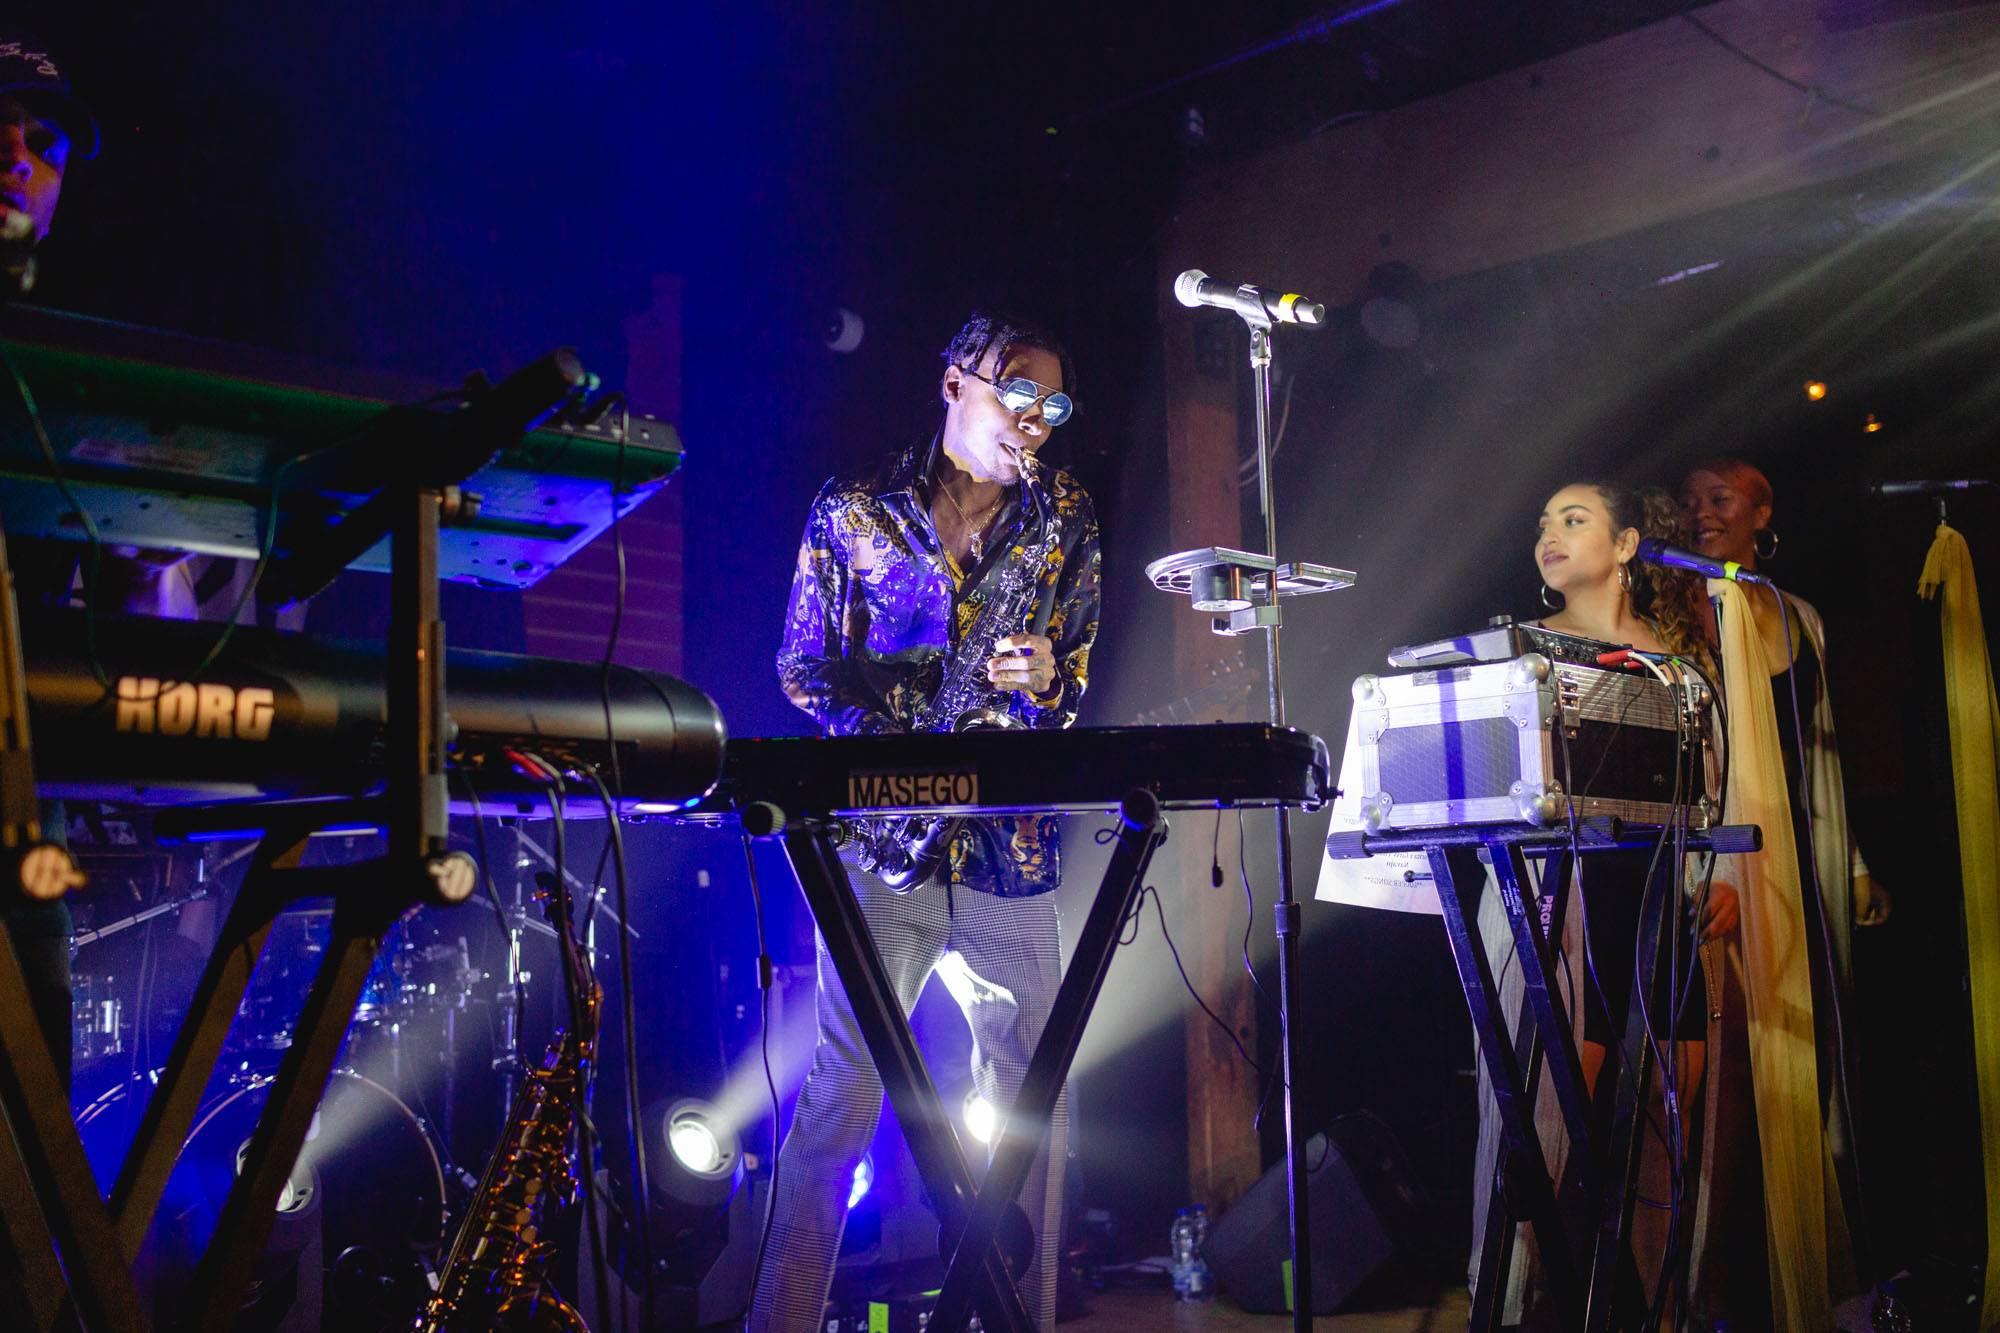 Masego at Fortune Sound Club, Vancouver, Nov 16 2018. Audrey Alexandrescu photo.